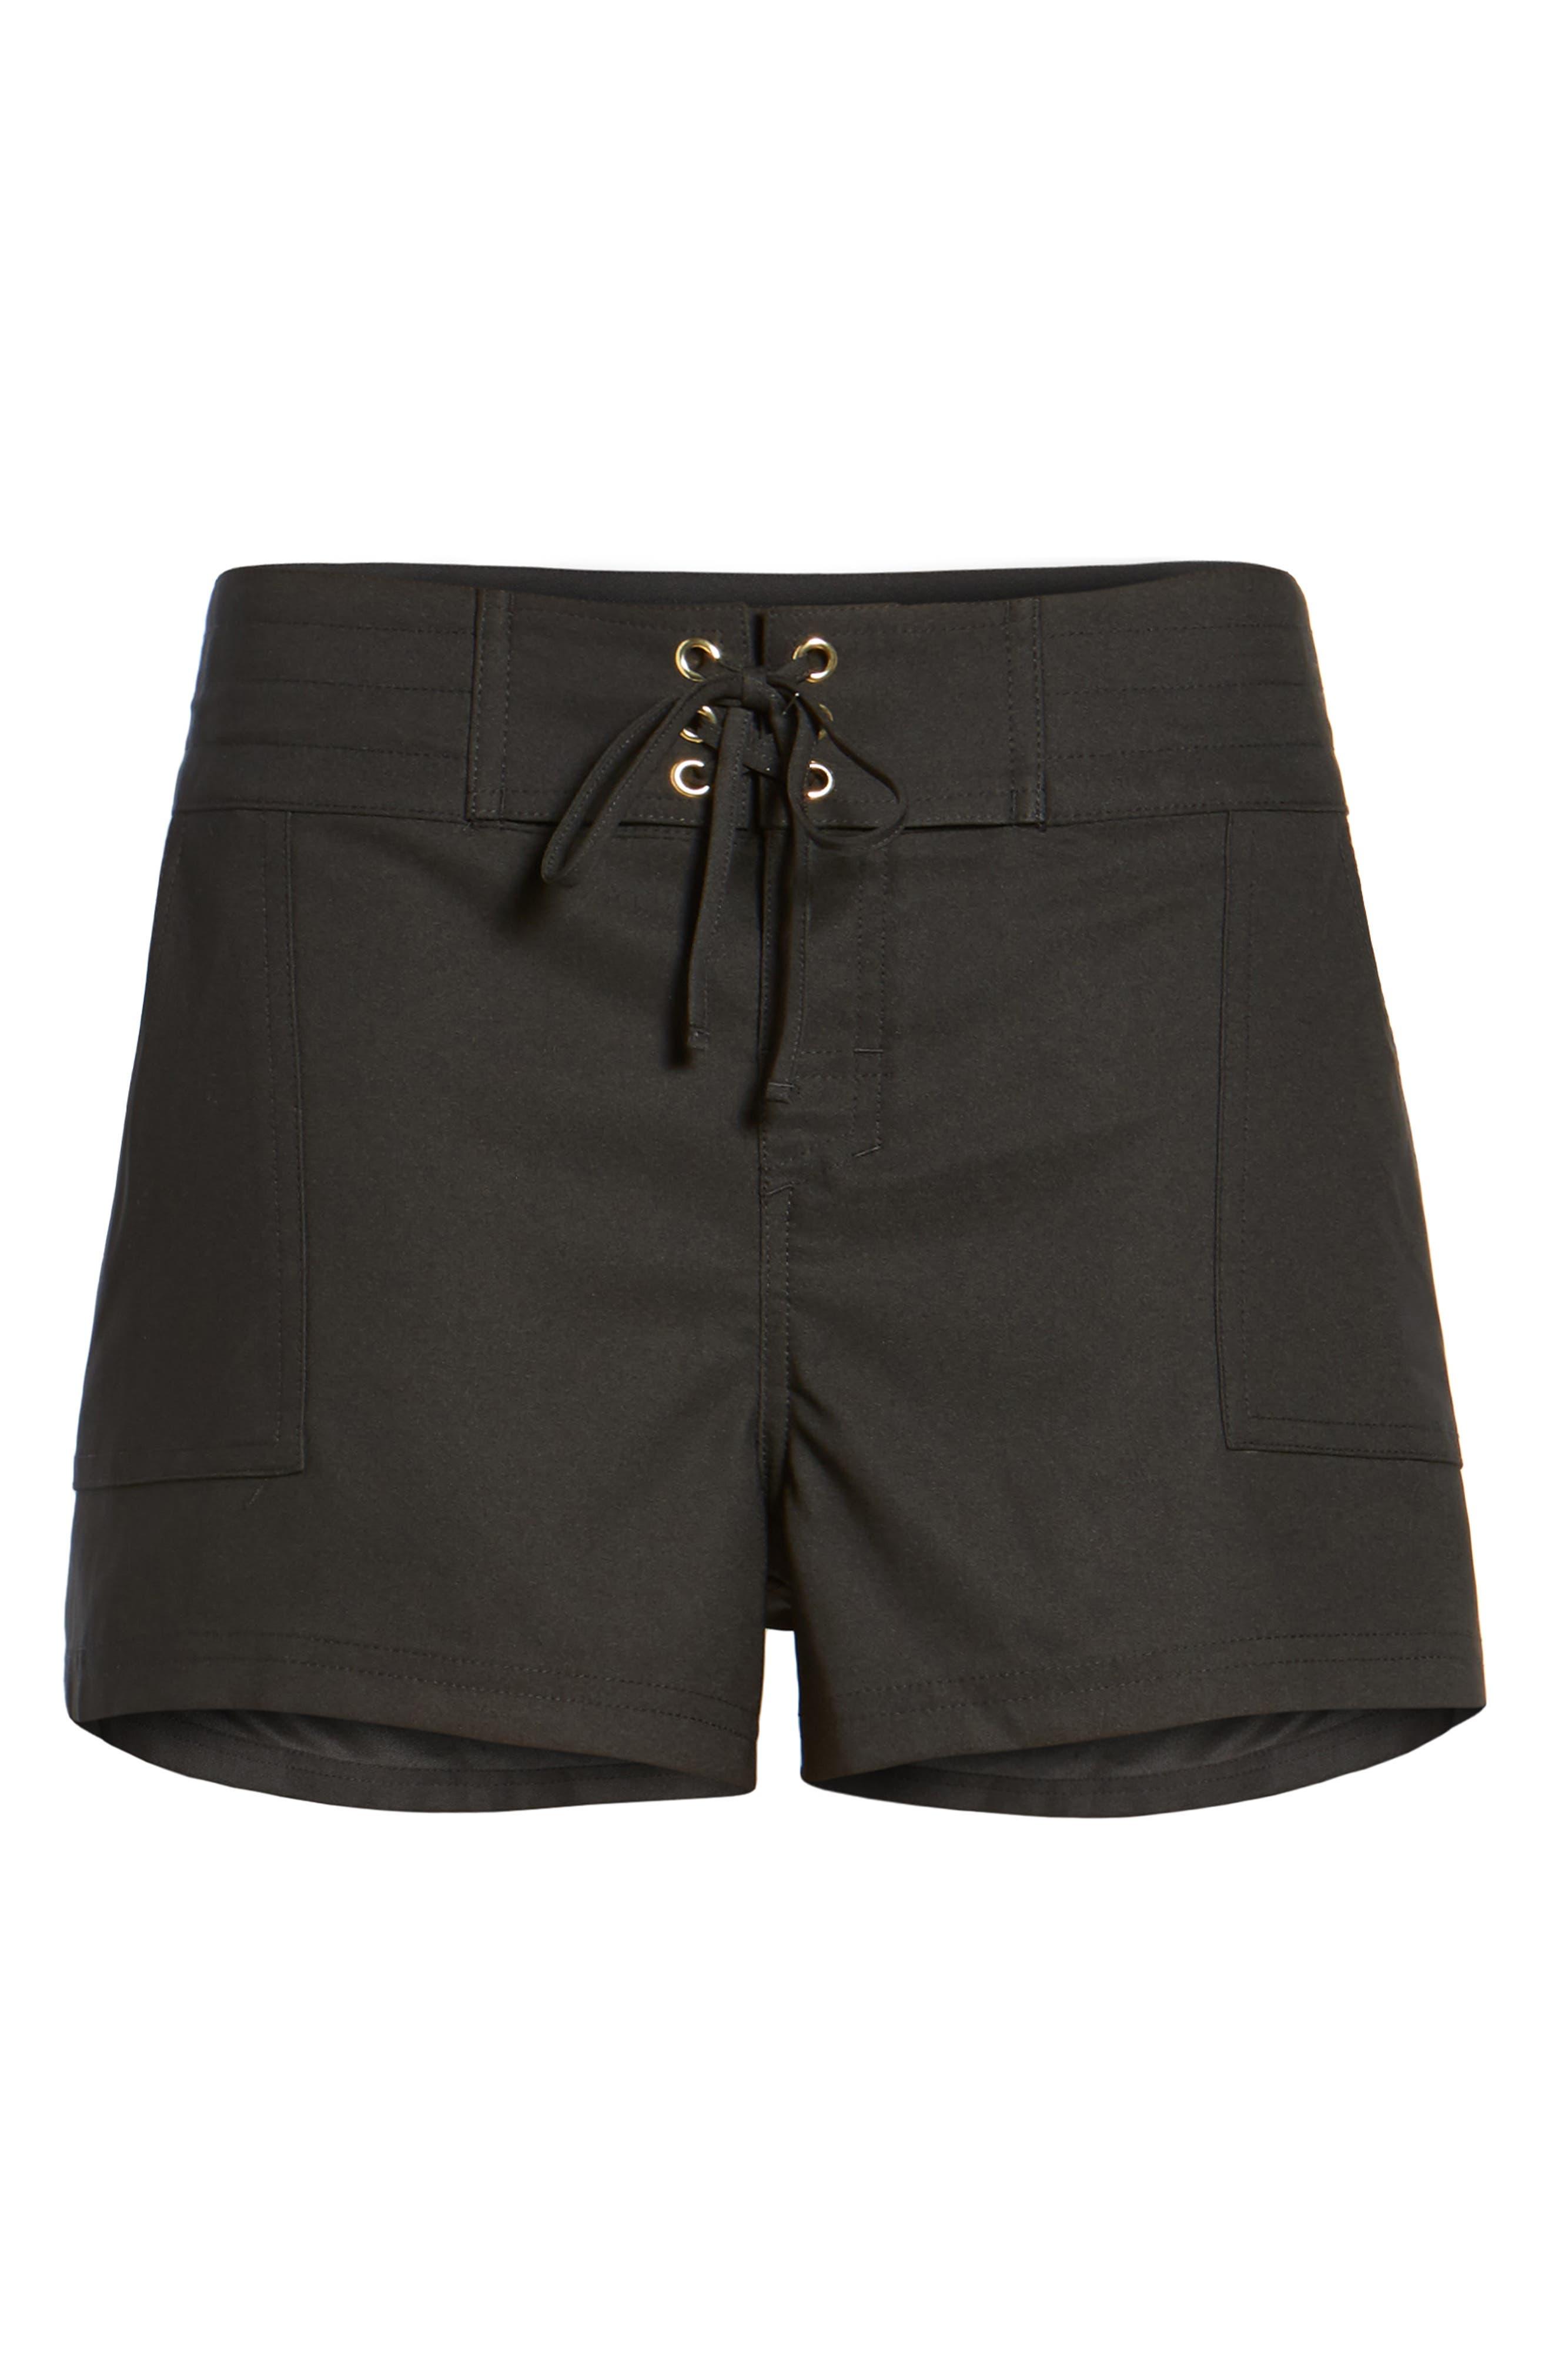 LA BLANCA, 'Boardwalk' Shorts, Main thumbnail 1, color, BLACK